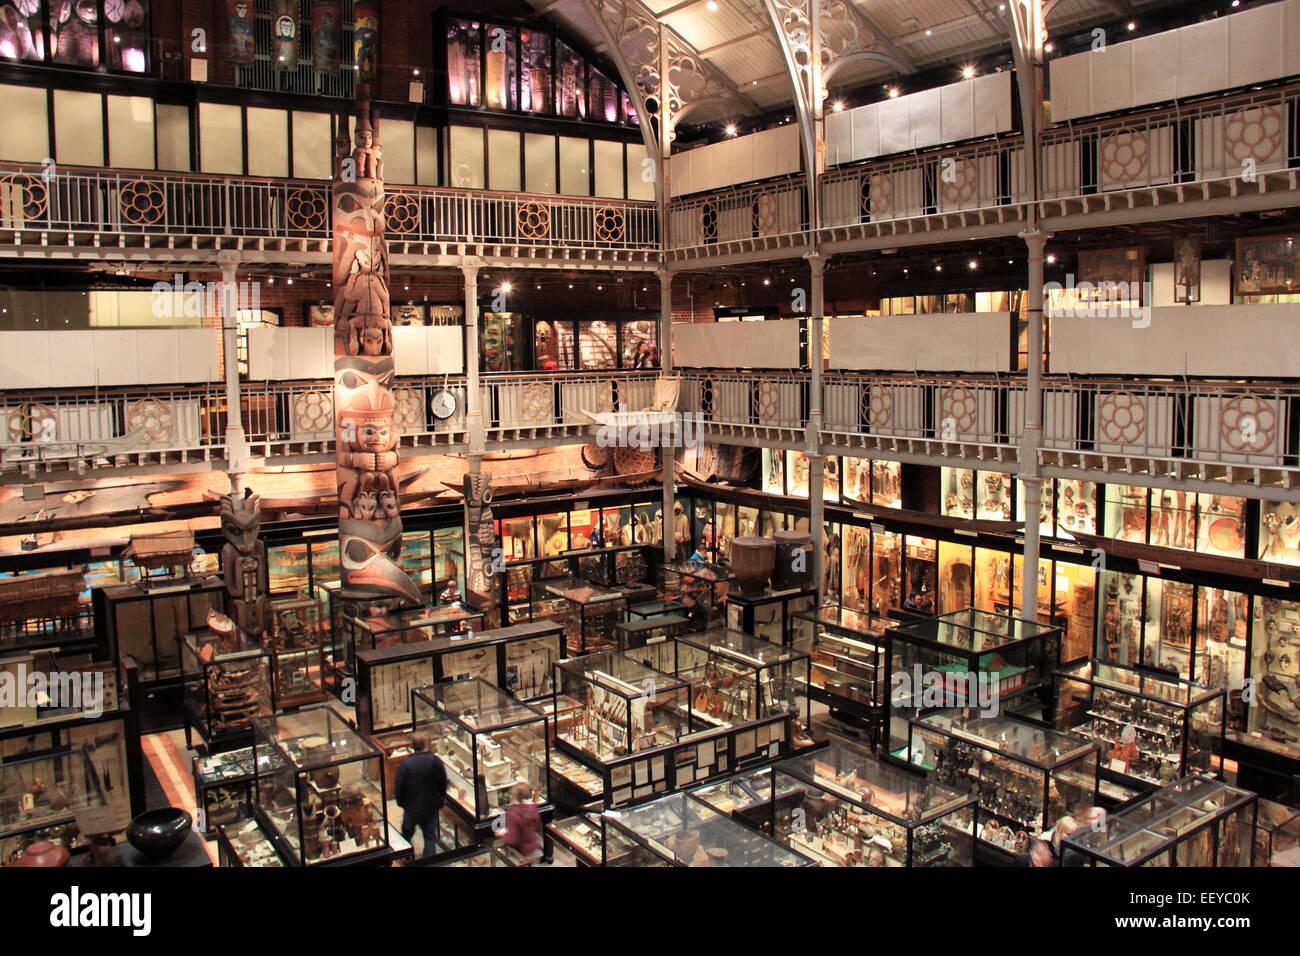 Pitt Rivers Museum, Oxford, Oxfordshire, England, Great Britain, United Kingdom, UK, Europe - Stock Image